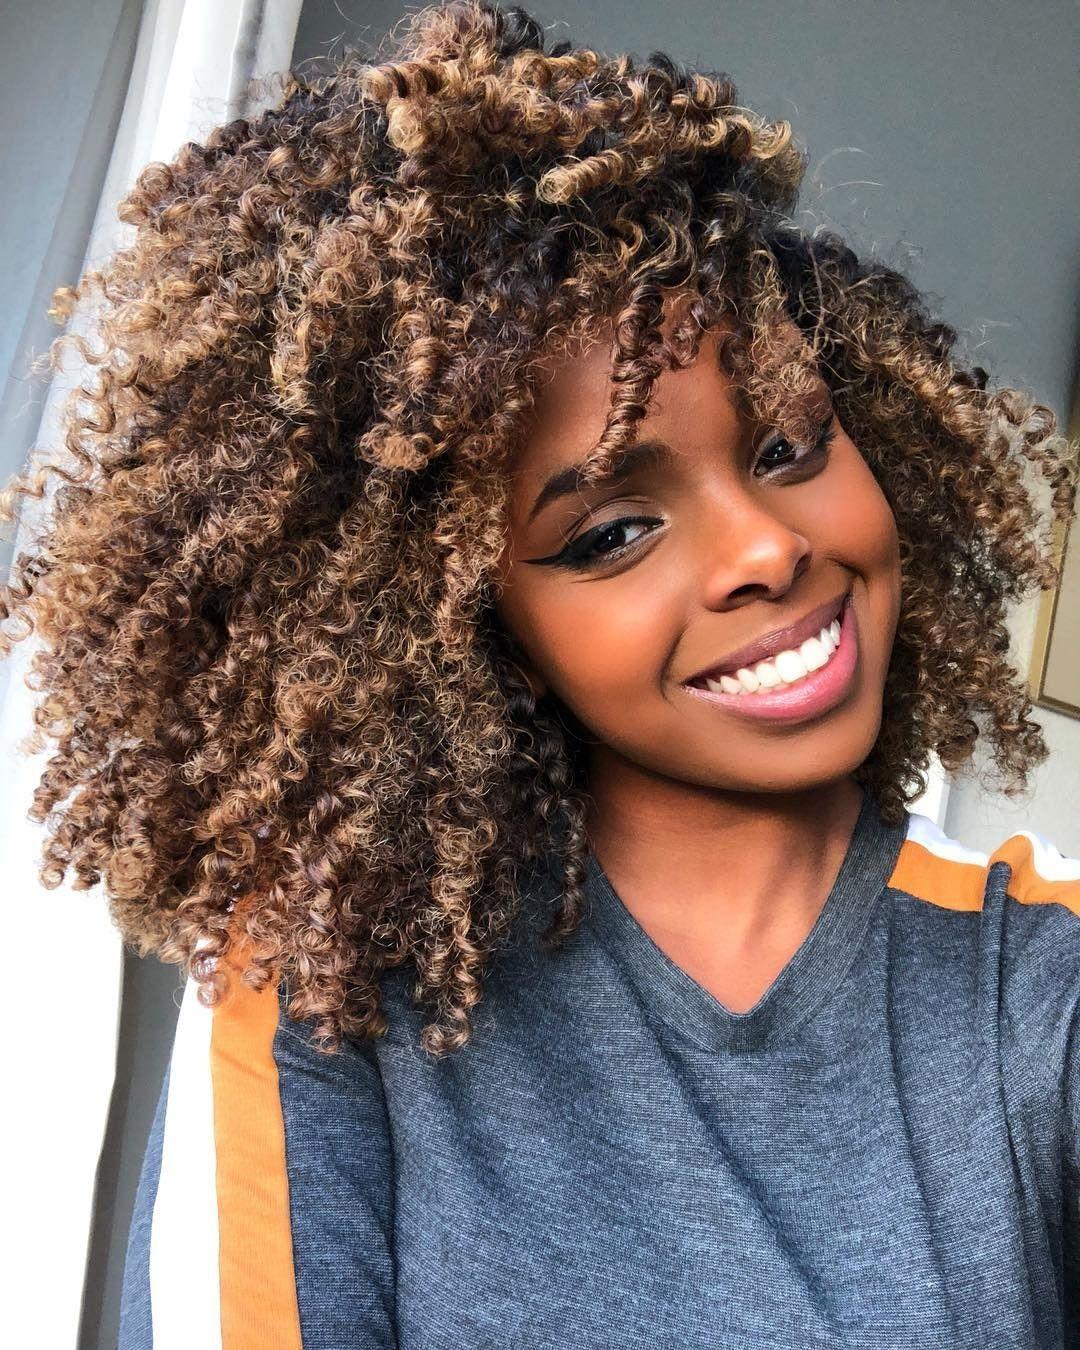 Afro Hairstyles hairstyleforblackwomen.net 19